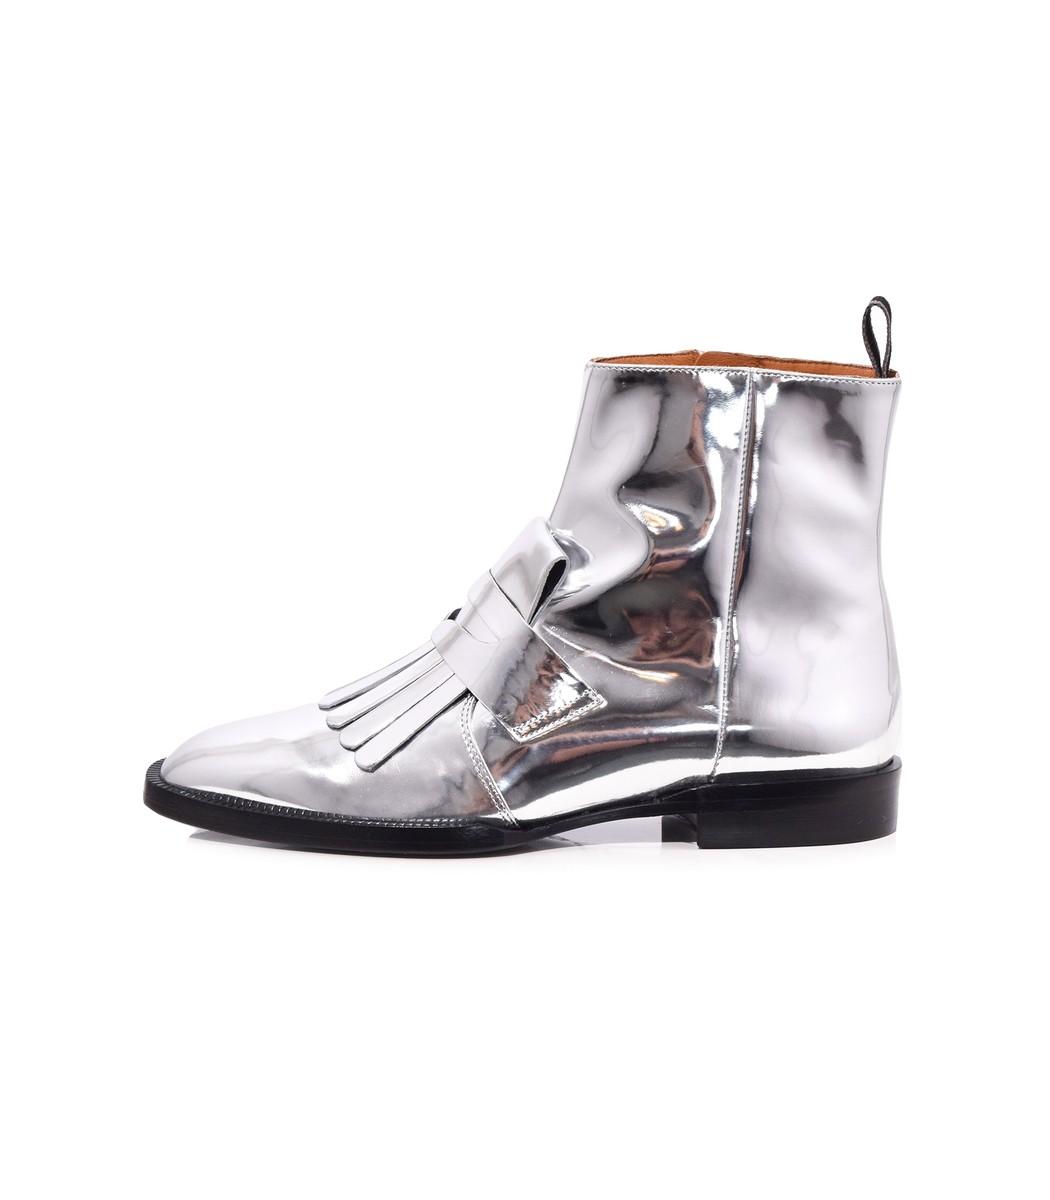 Yousc Boot in Silver